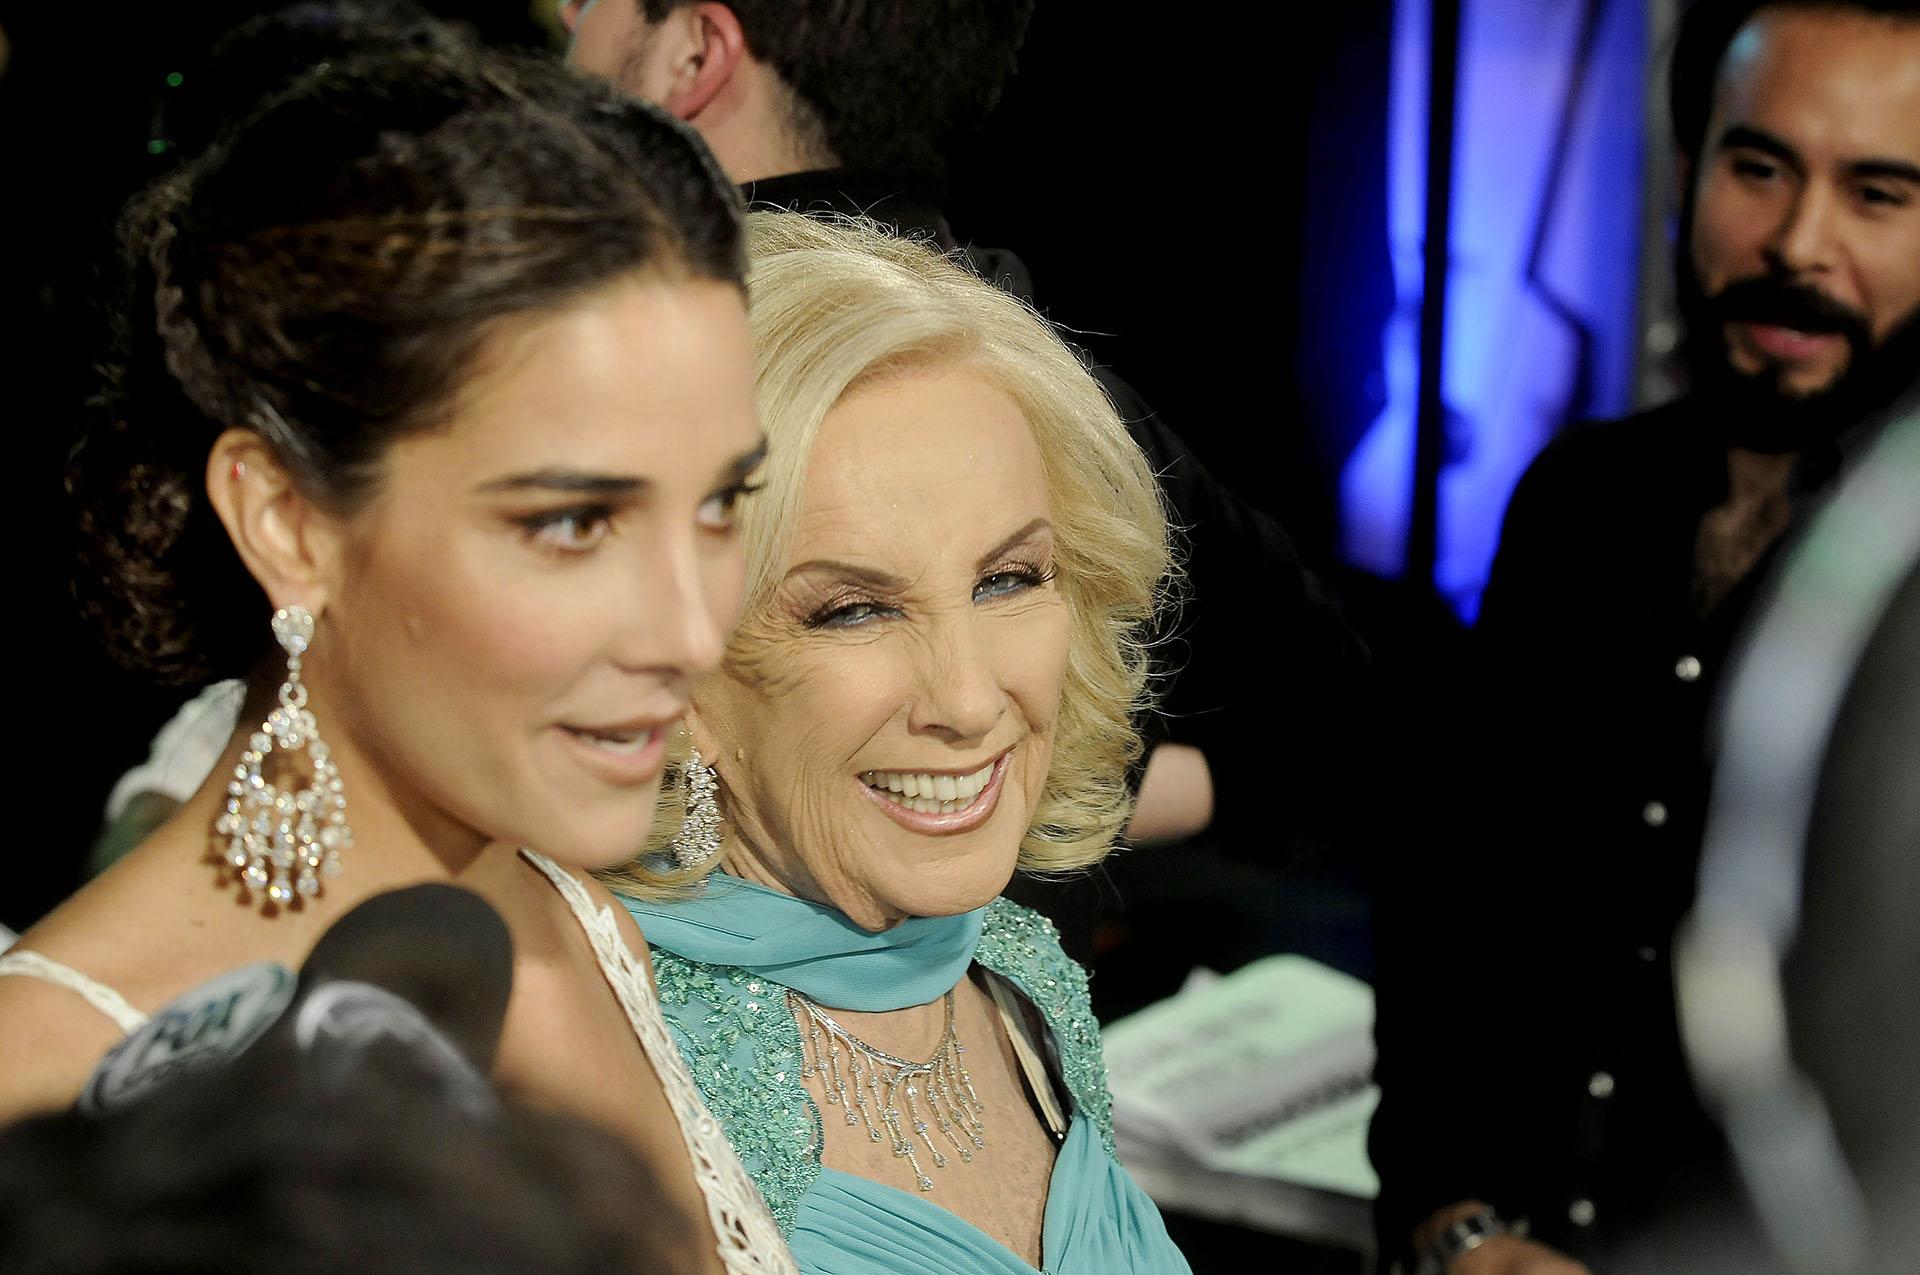 Juanita Viale y Mirtha Legrand (DyN)